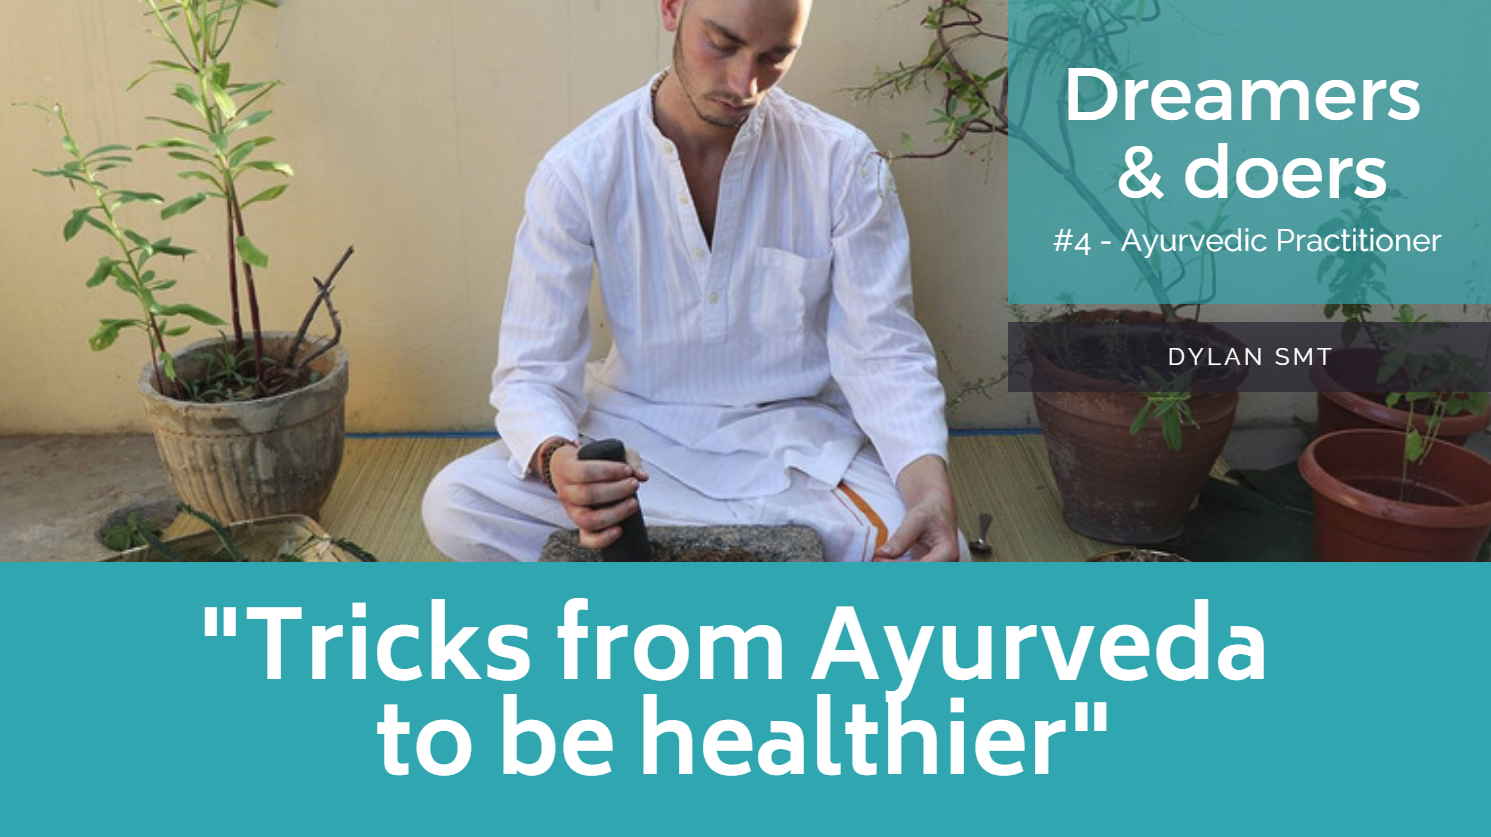 Copy of Ayurvedic Practitioner